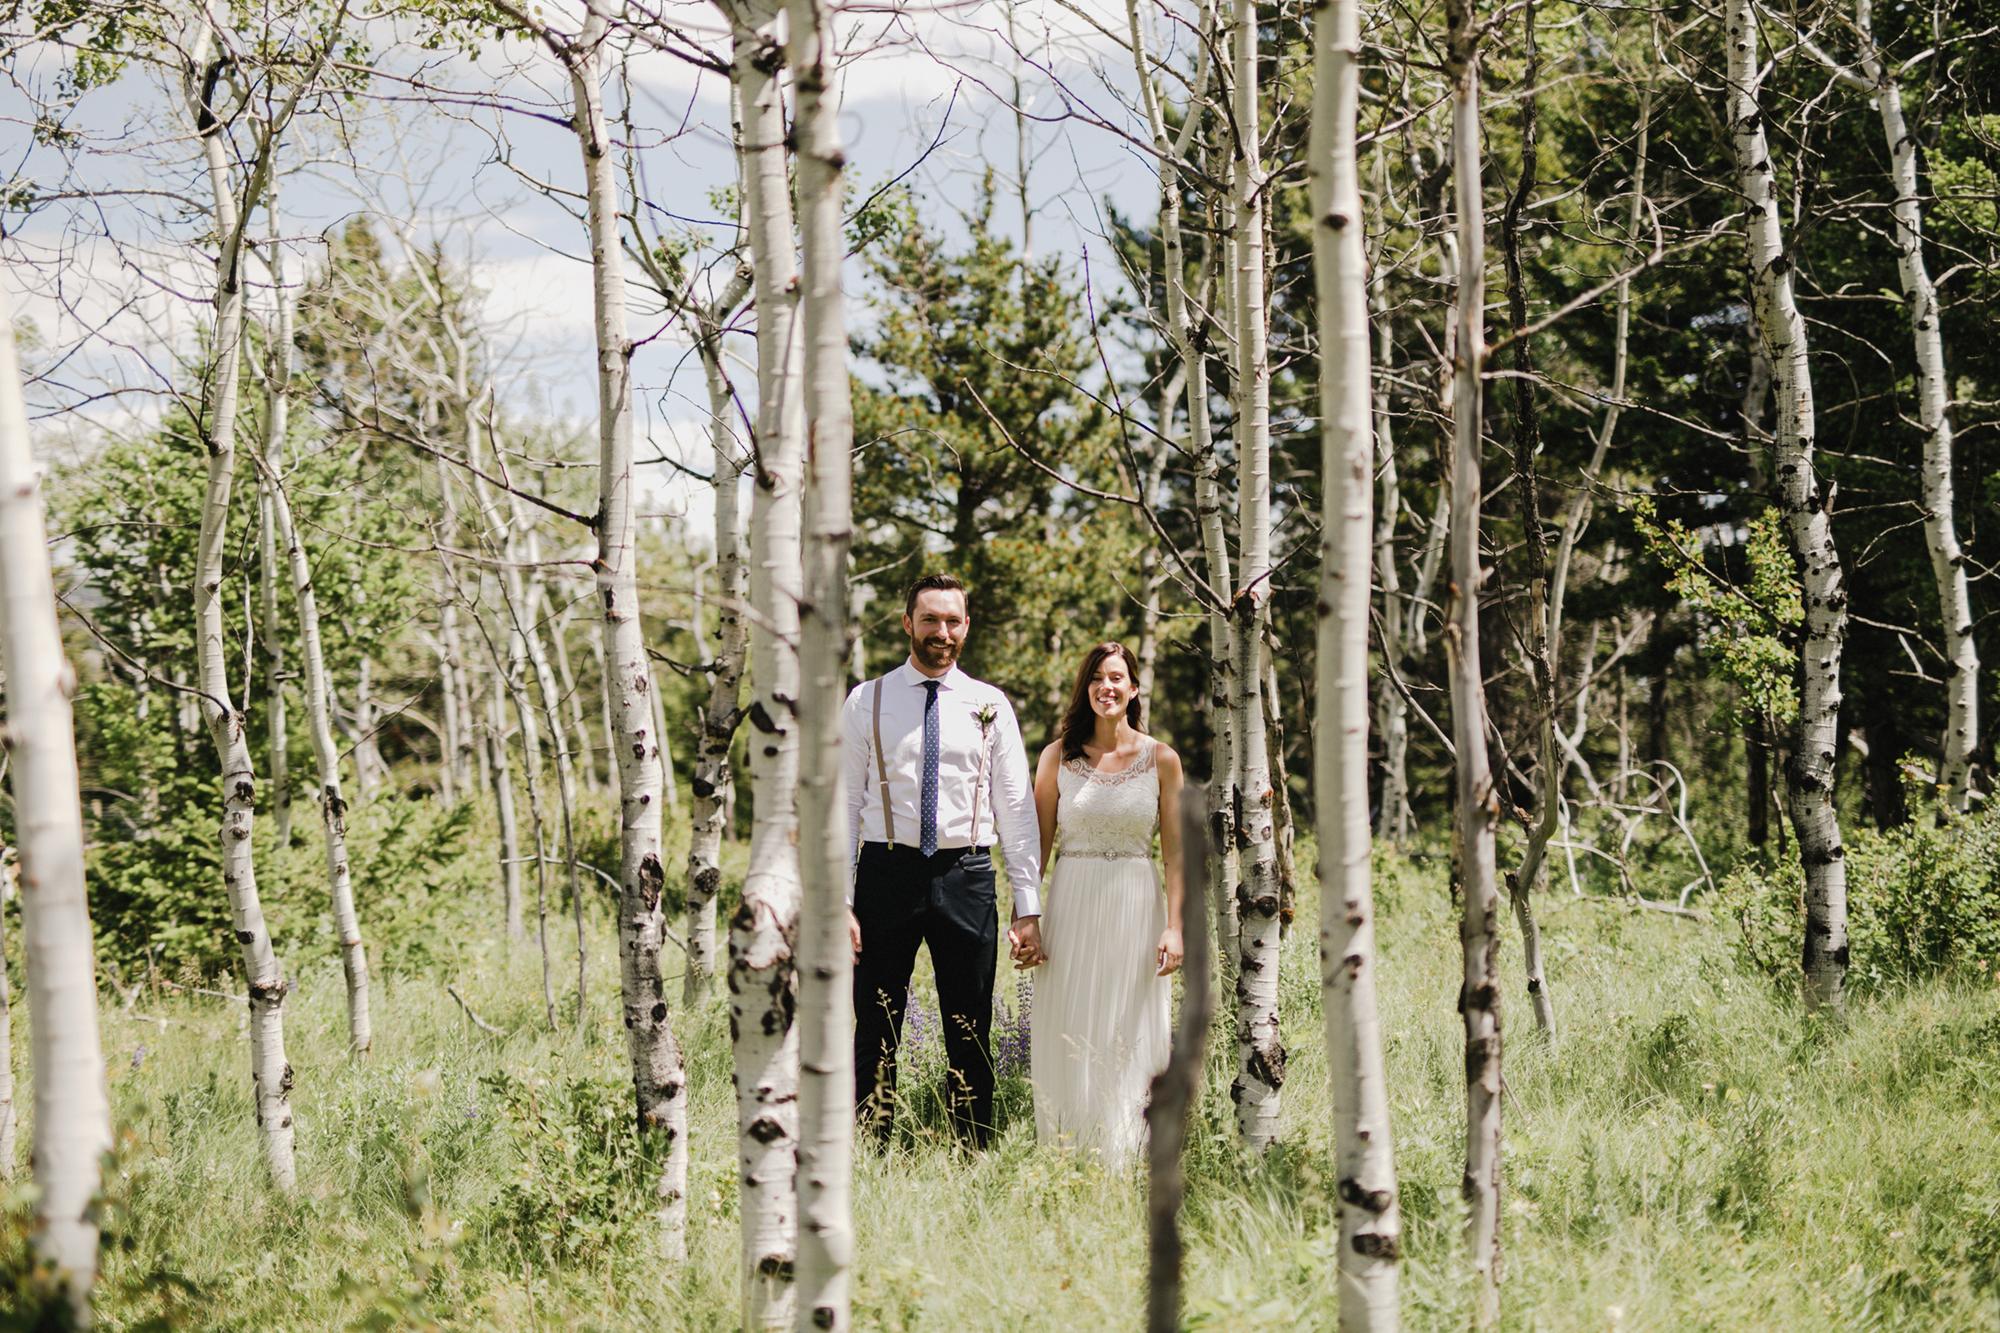 Flower Farm Crowsnest Pass Wedding -029.JPG